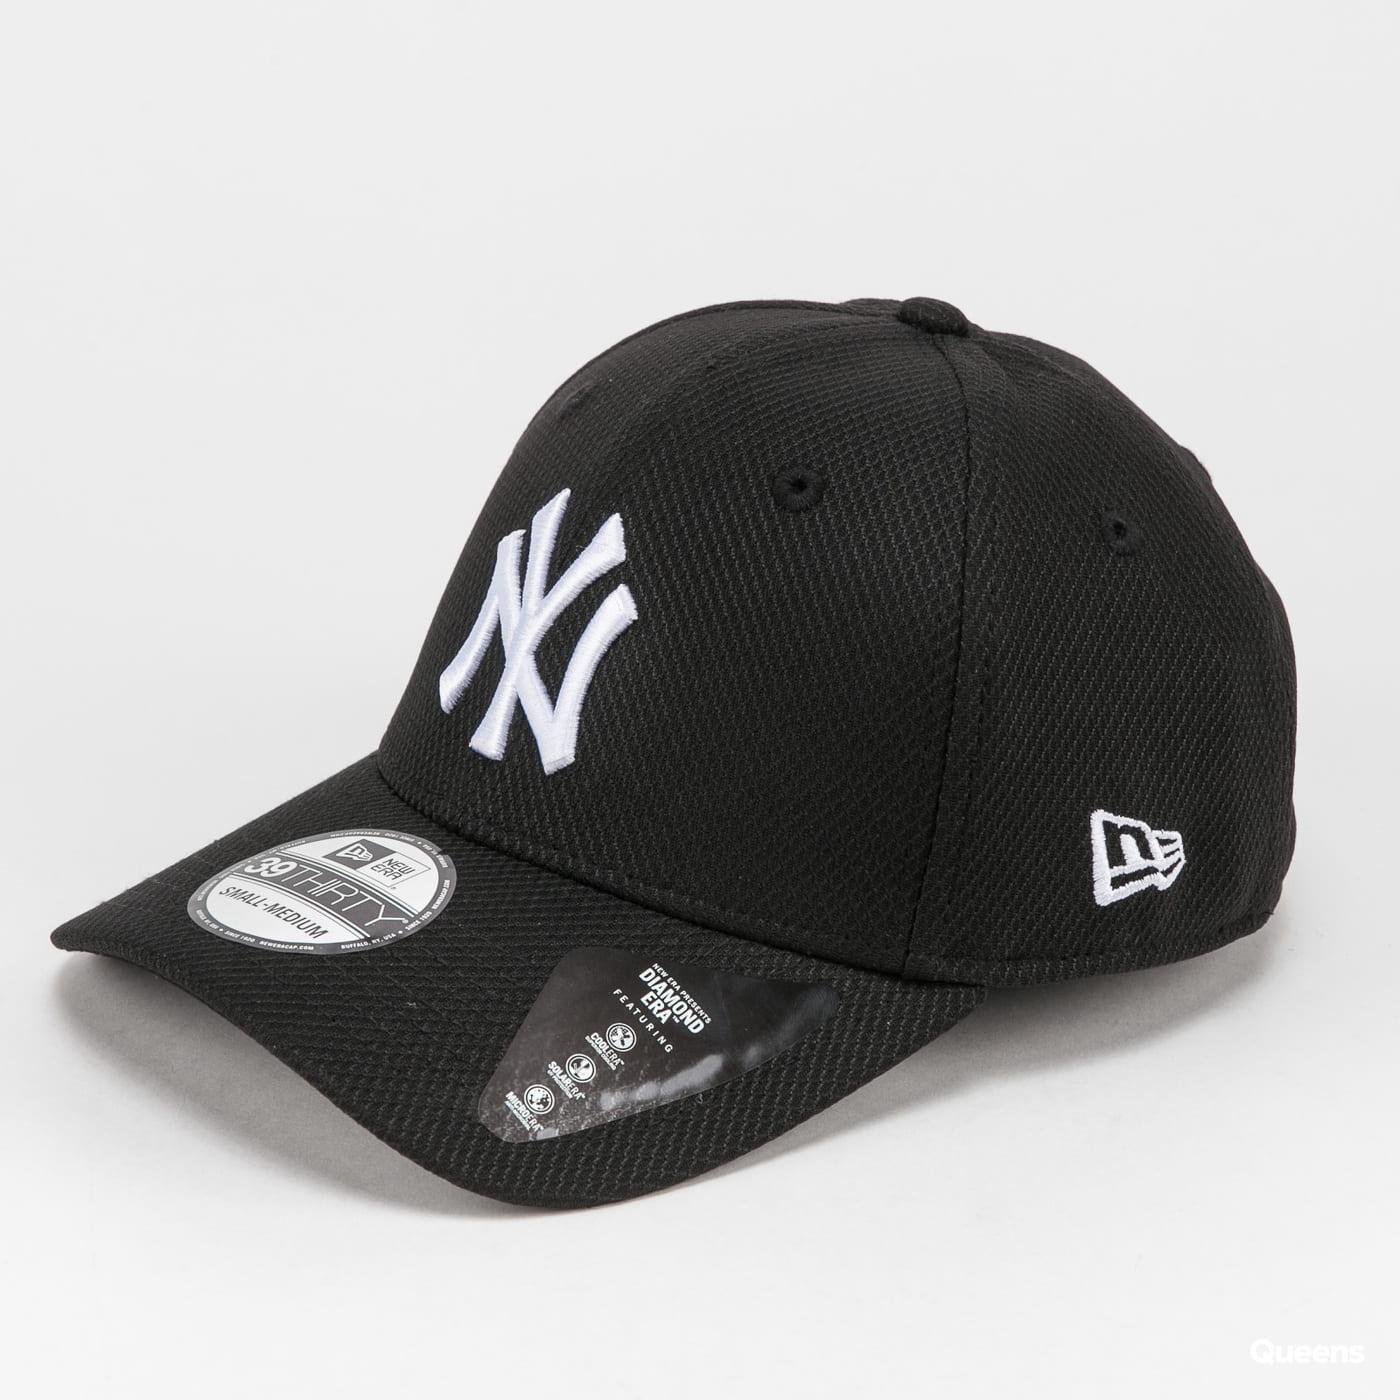 New Era 3930 MLB Diamond Era NY černá / bílá